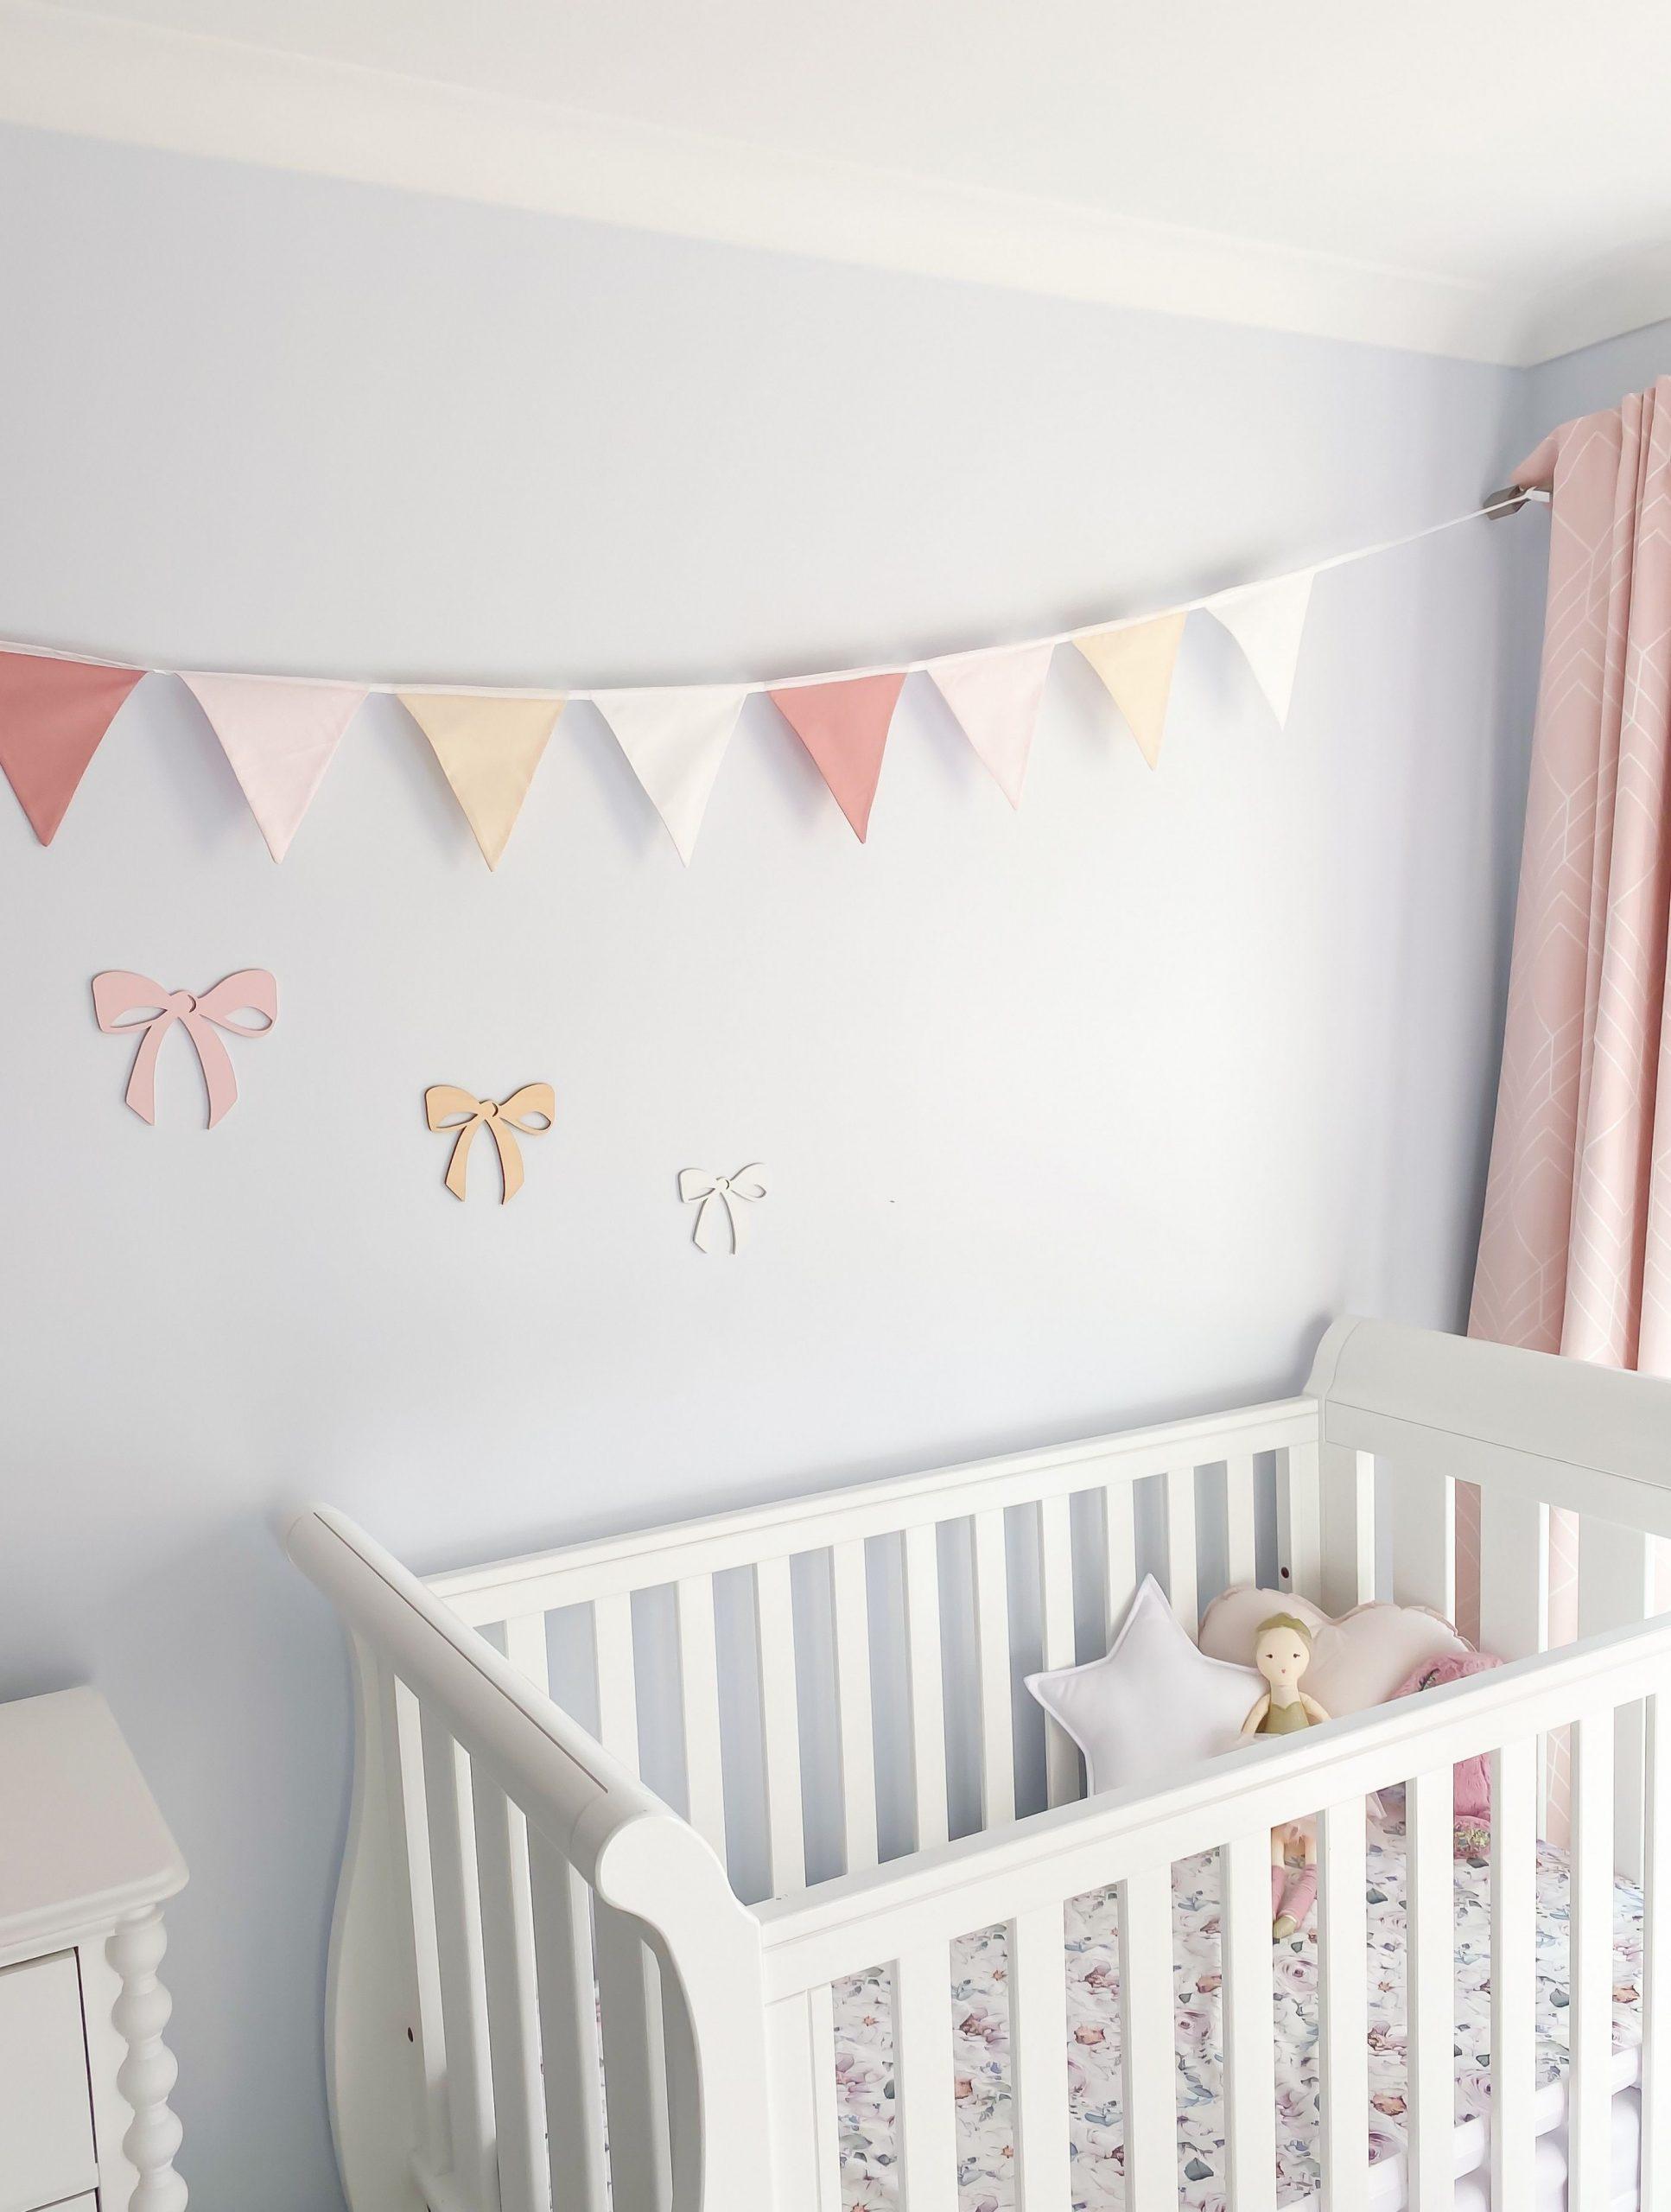 Nursery Bunting - Dusty Pink 9 flag  Baby room wall decor  - Baby Room Bunting